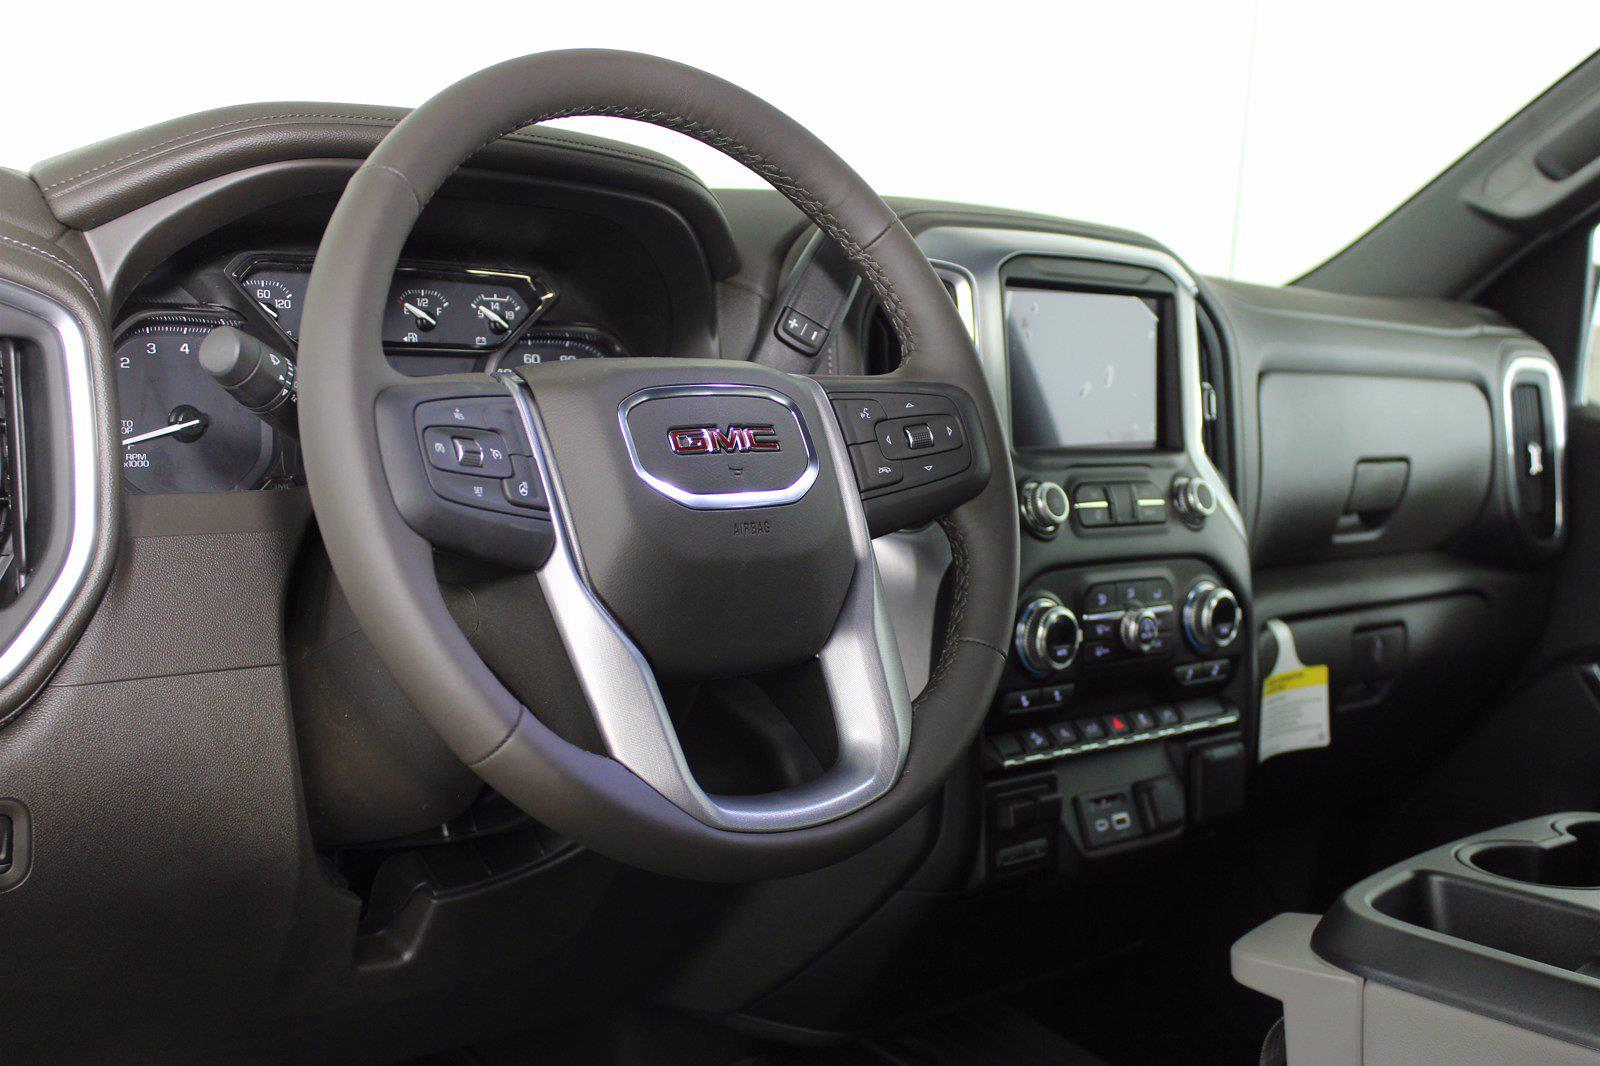 2021 GMC Sierra 1500 Crew Cab 4x4, Pickup #D411070 - photo 10